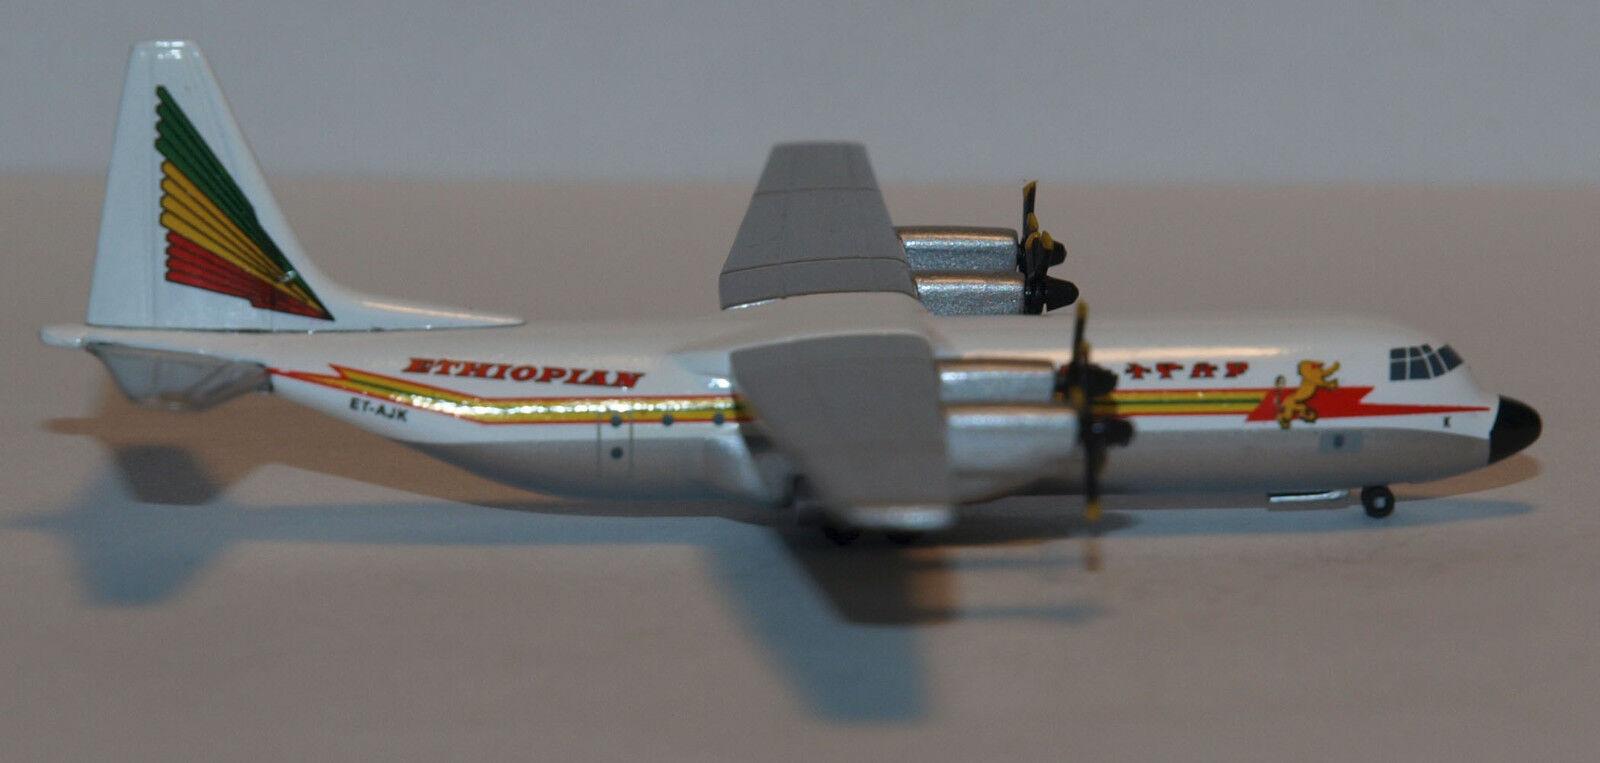 Herpa Wings 1 500 Ethiopian L-100-30 prod id 514392 released 2005